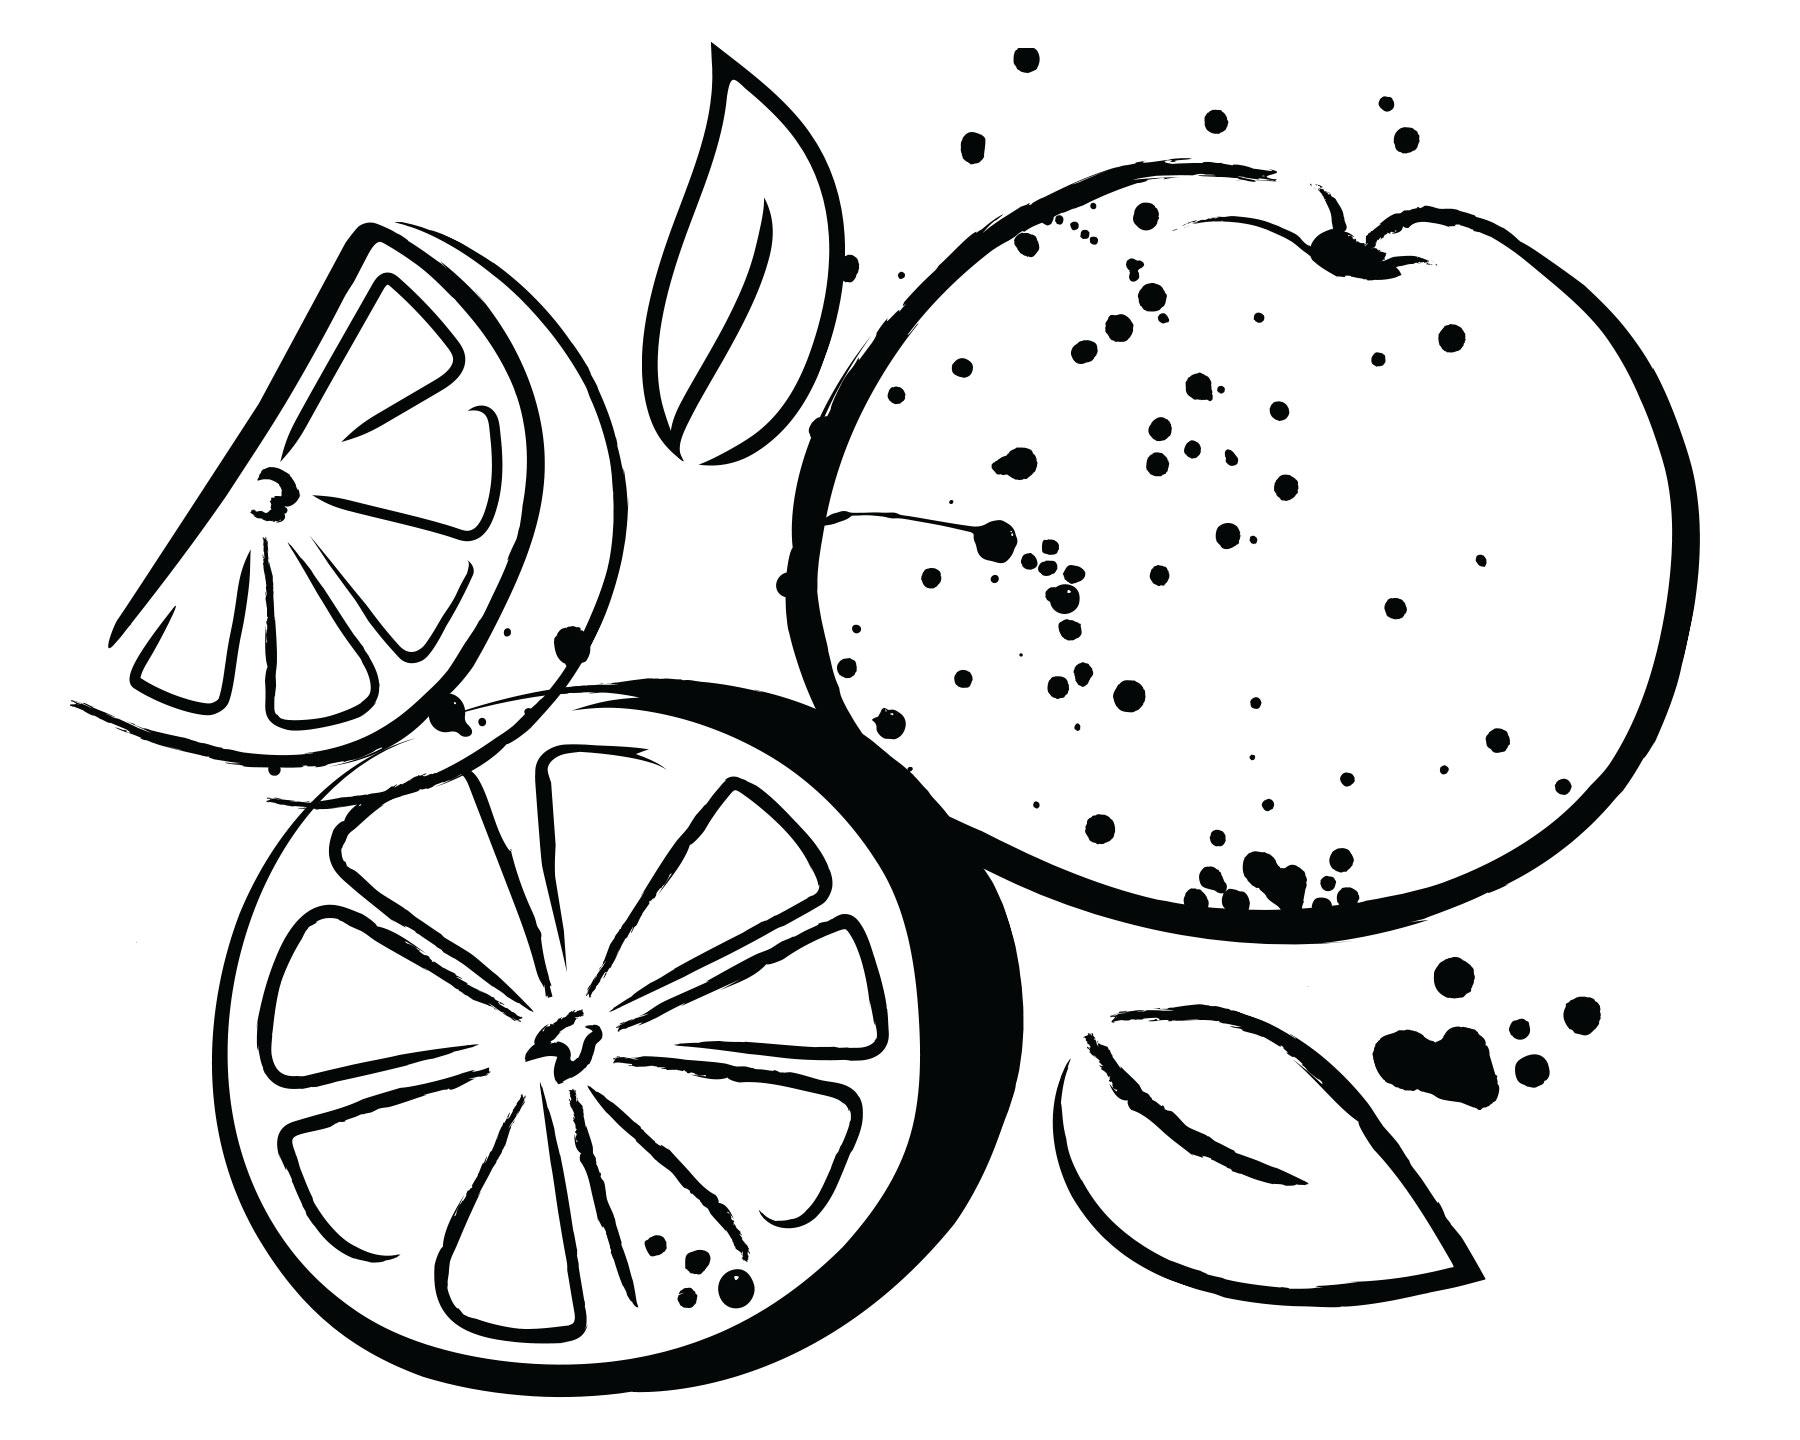 whole_foods_market_rebrand_illustration_oranges_laura_guard